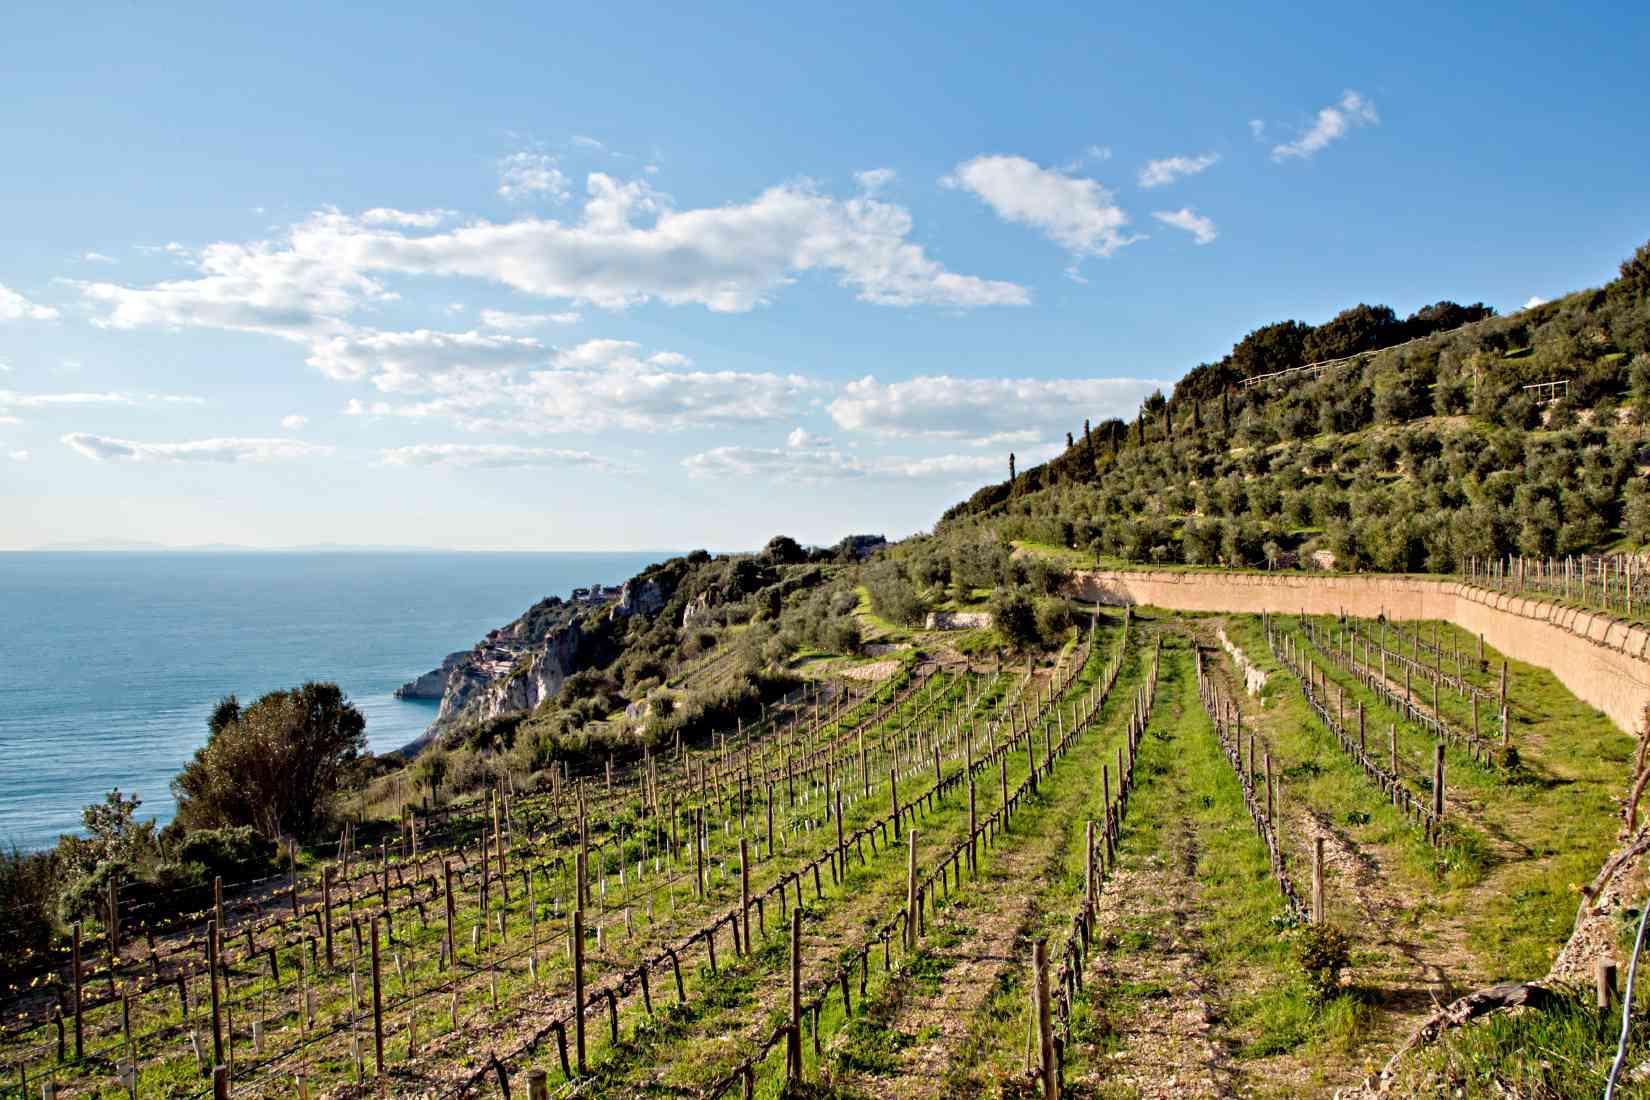 Capo d'Uomo vineyard and the Tyrrhenian Sea